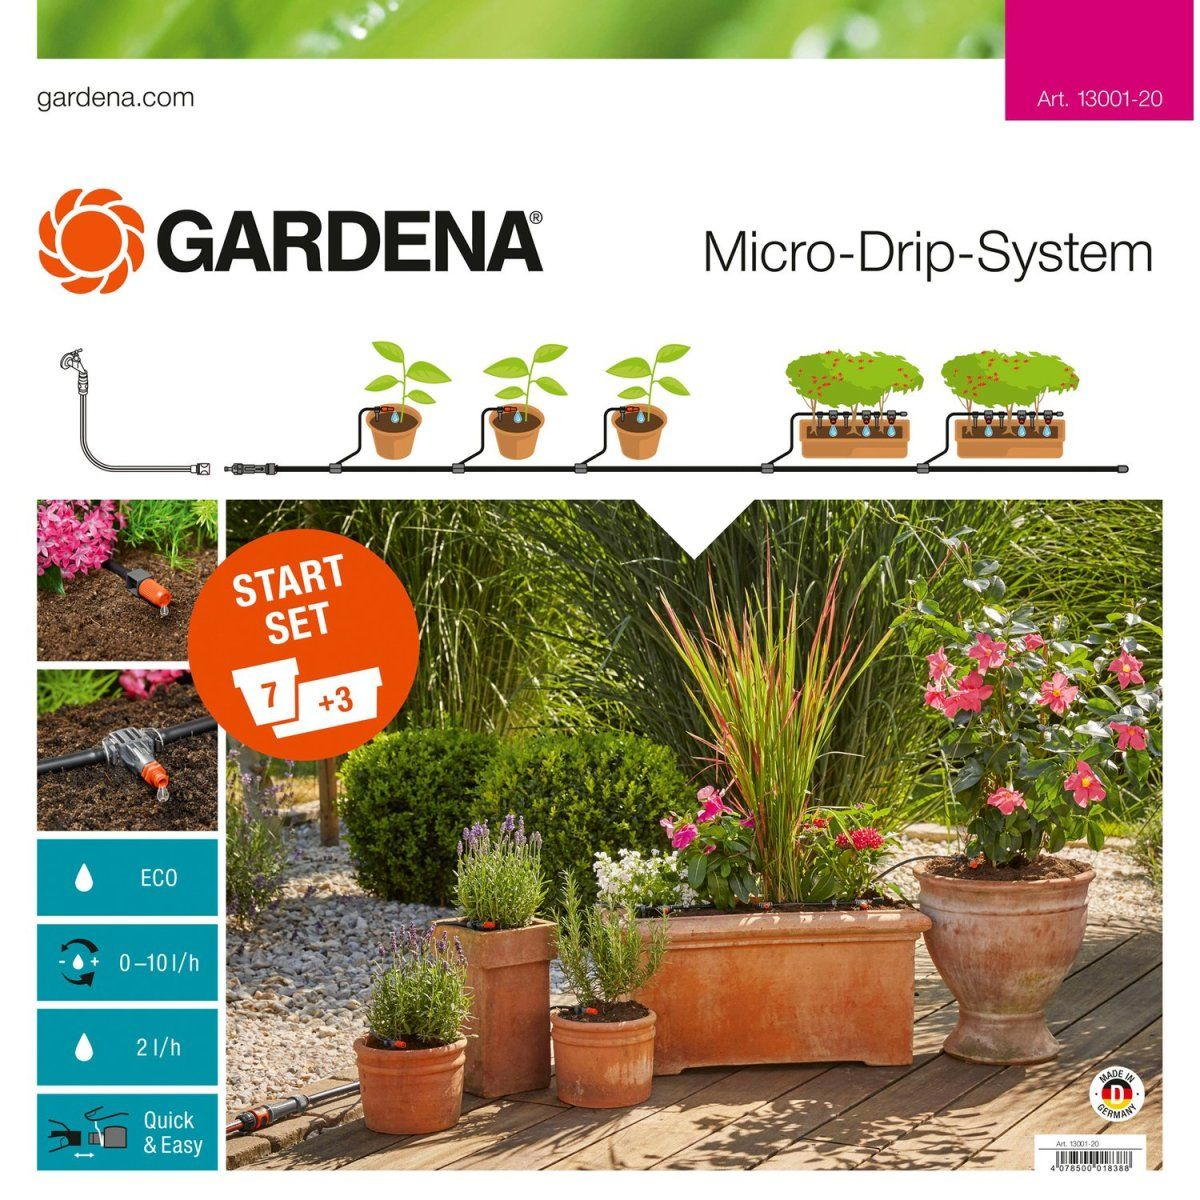 Gardena Mds Start Set Pflanztopfe M Jetzt Bestellen Unter Https Moebel Ladendirekt De Garten Gartenmoeb Pflanzen Micro Drip System Gardena Micro Drip System